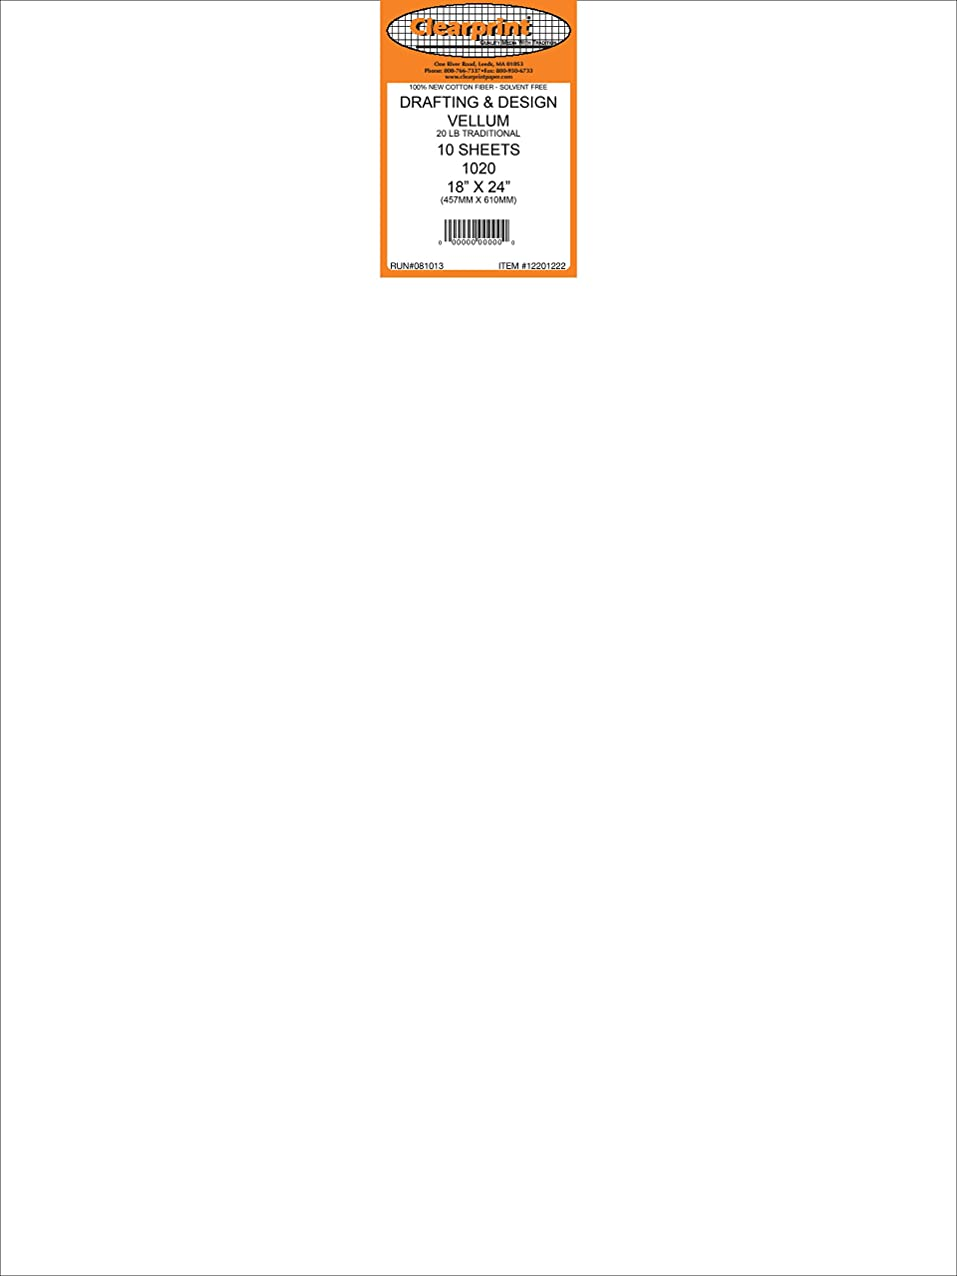 Clearprint 1020H Design Vellum Sheets, 20 lb, 100% Cotton, 18 x 24 Inches, 10 Sheets Per Pack, Translucent White, 1 Each (12201222) cdzusgrosuhss764